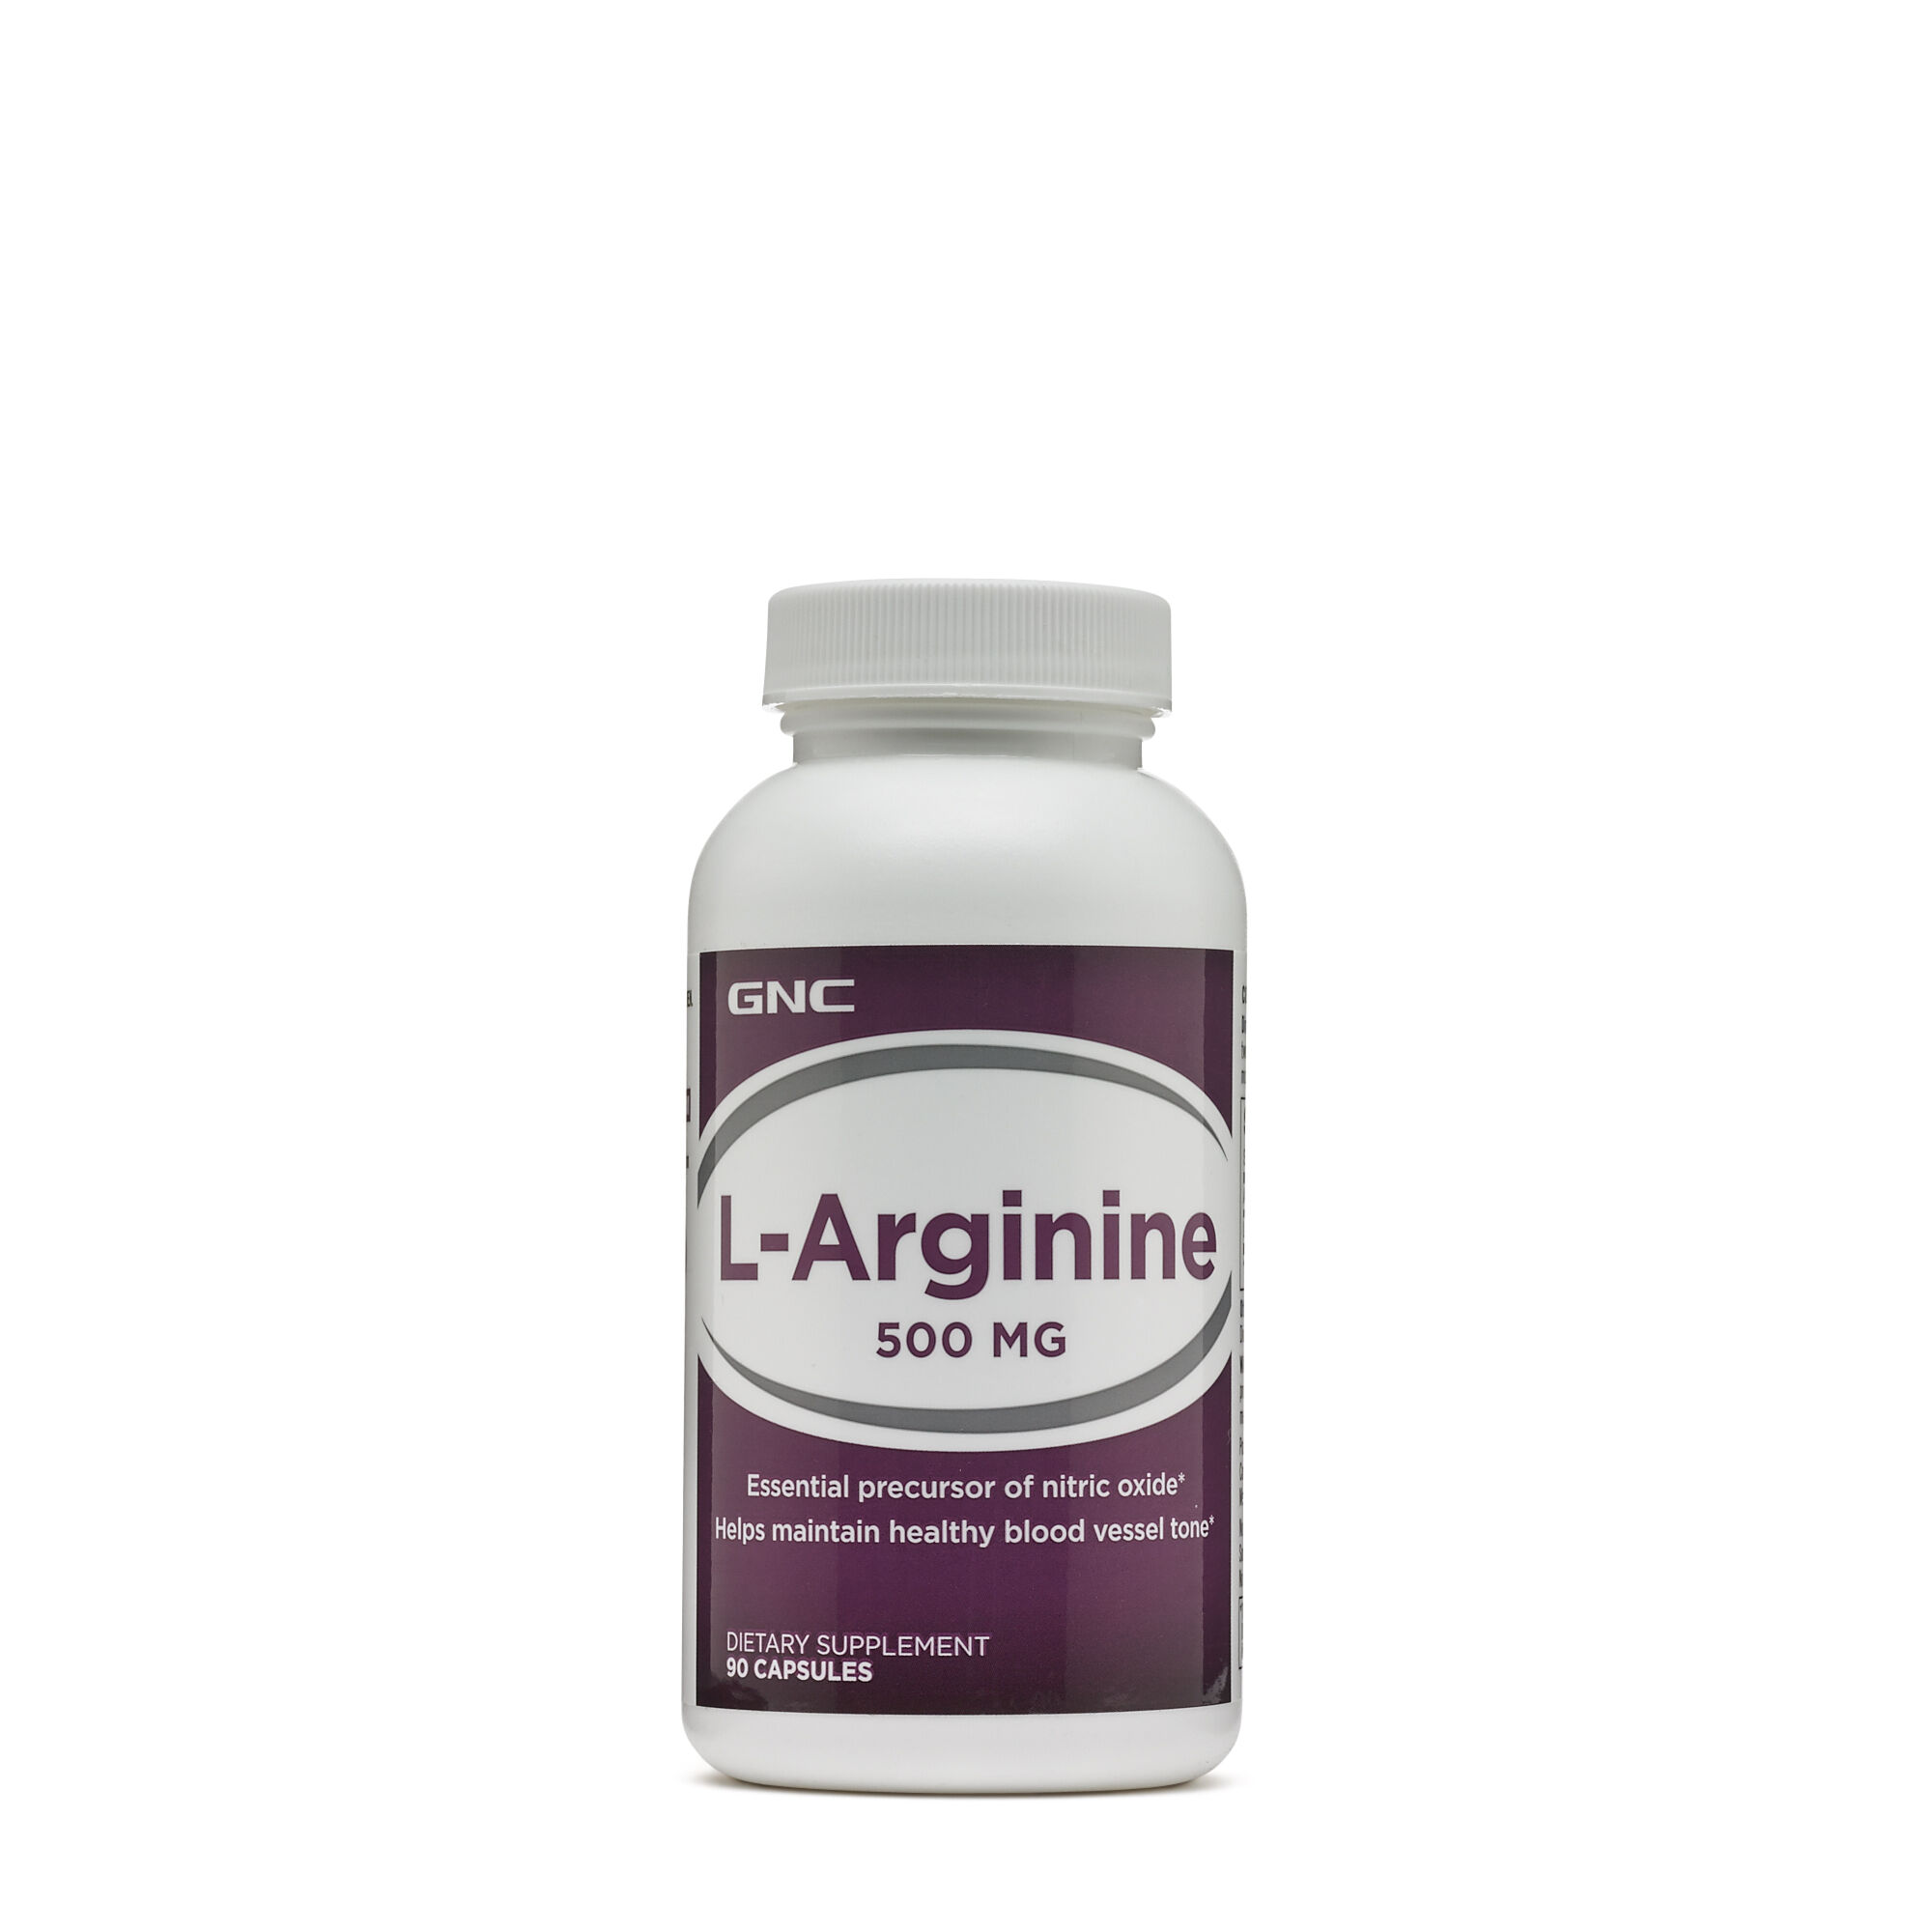 GNC L-Arginine 500 MG 48107123437 | eBay